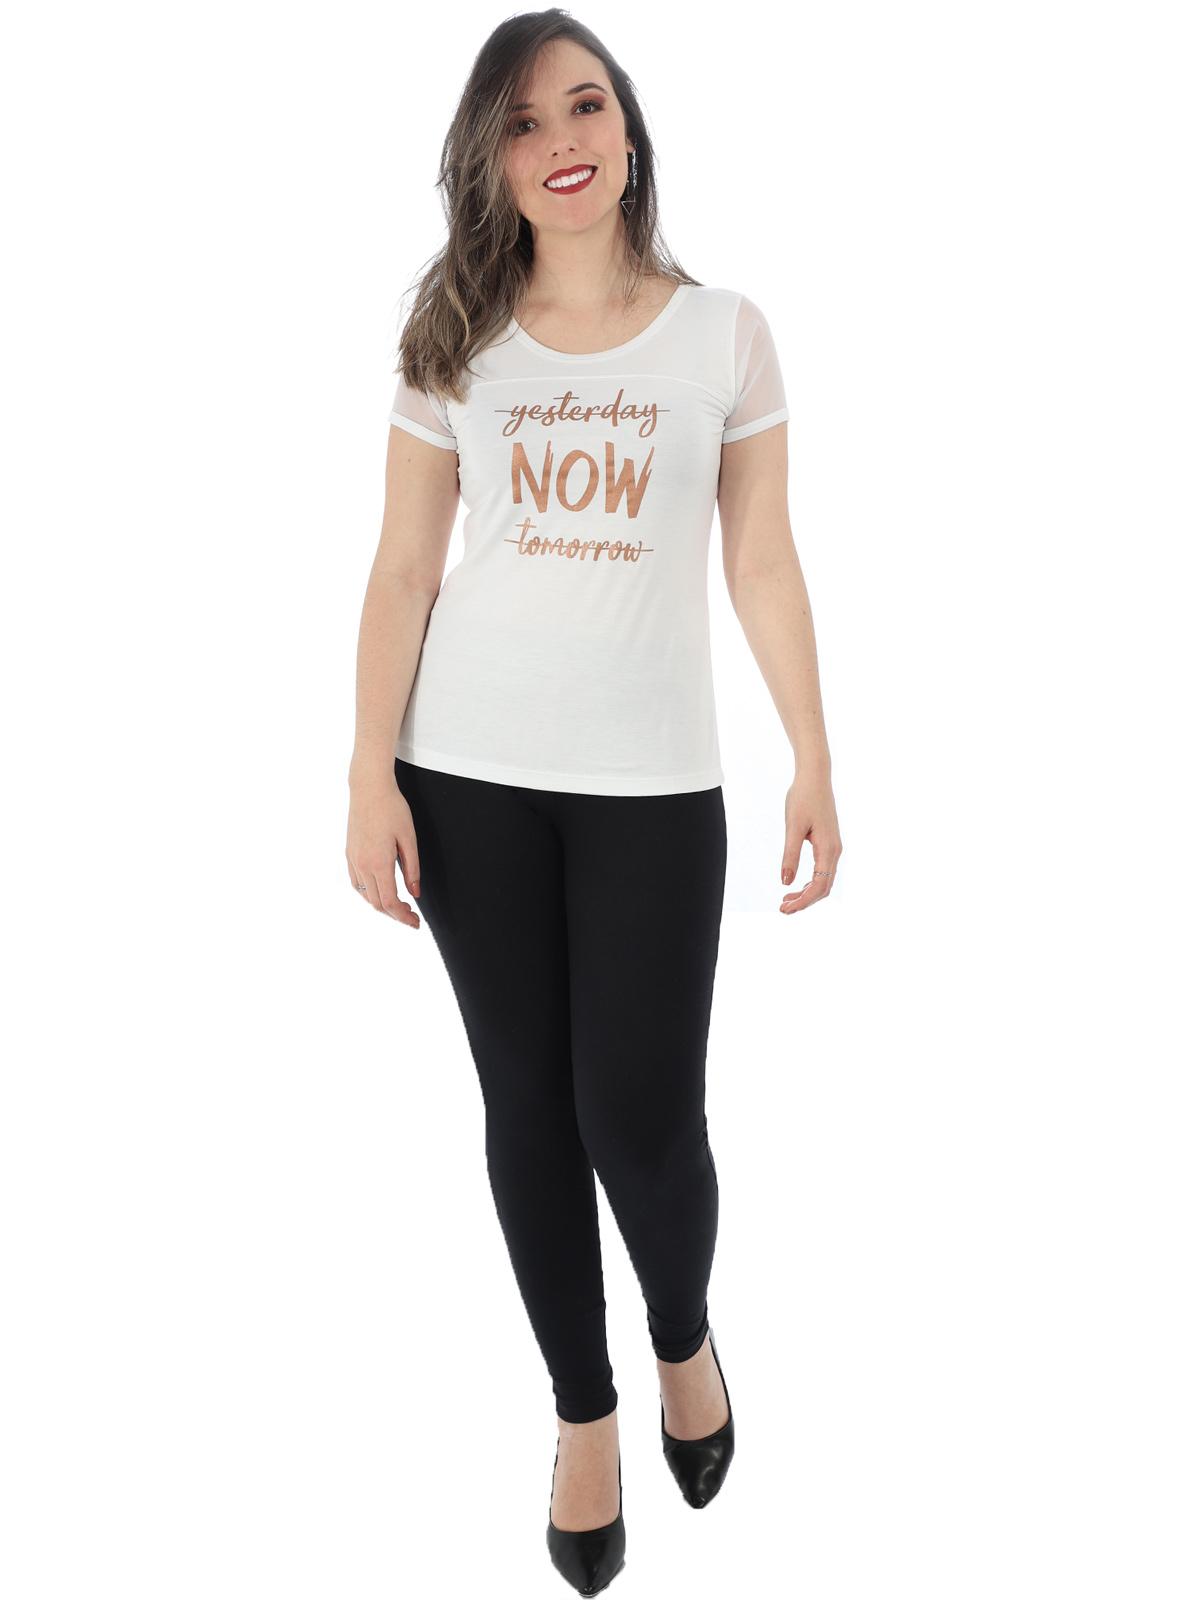 Blusa Feminina Com Estampa Manga Curta em Tule Branca